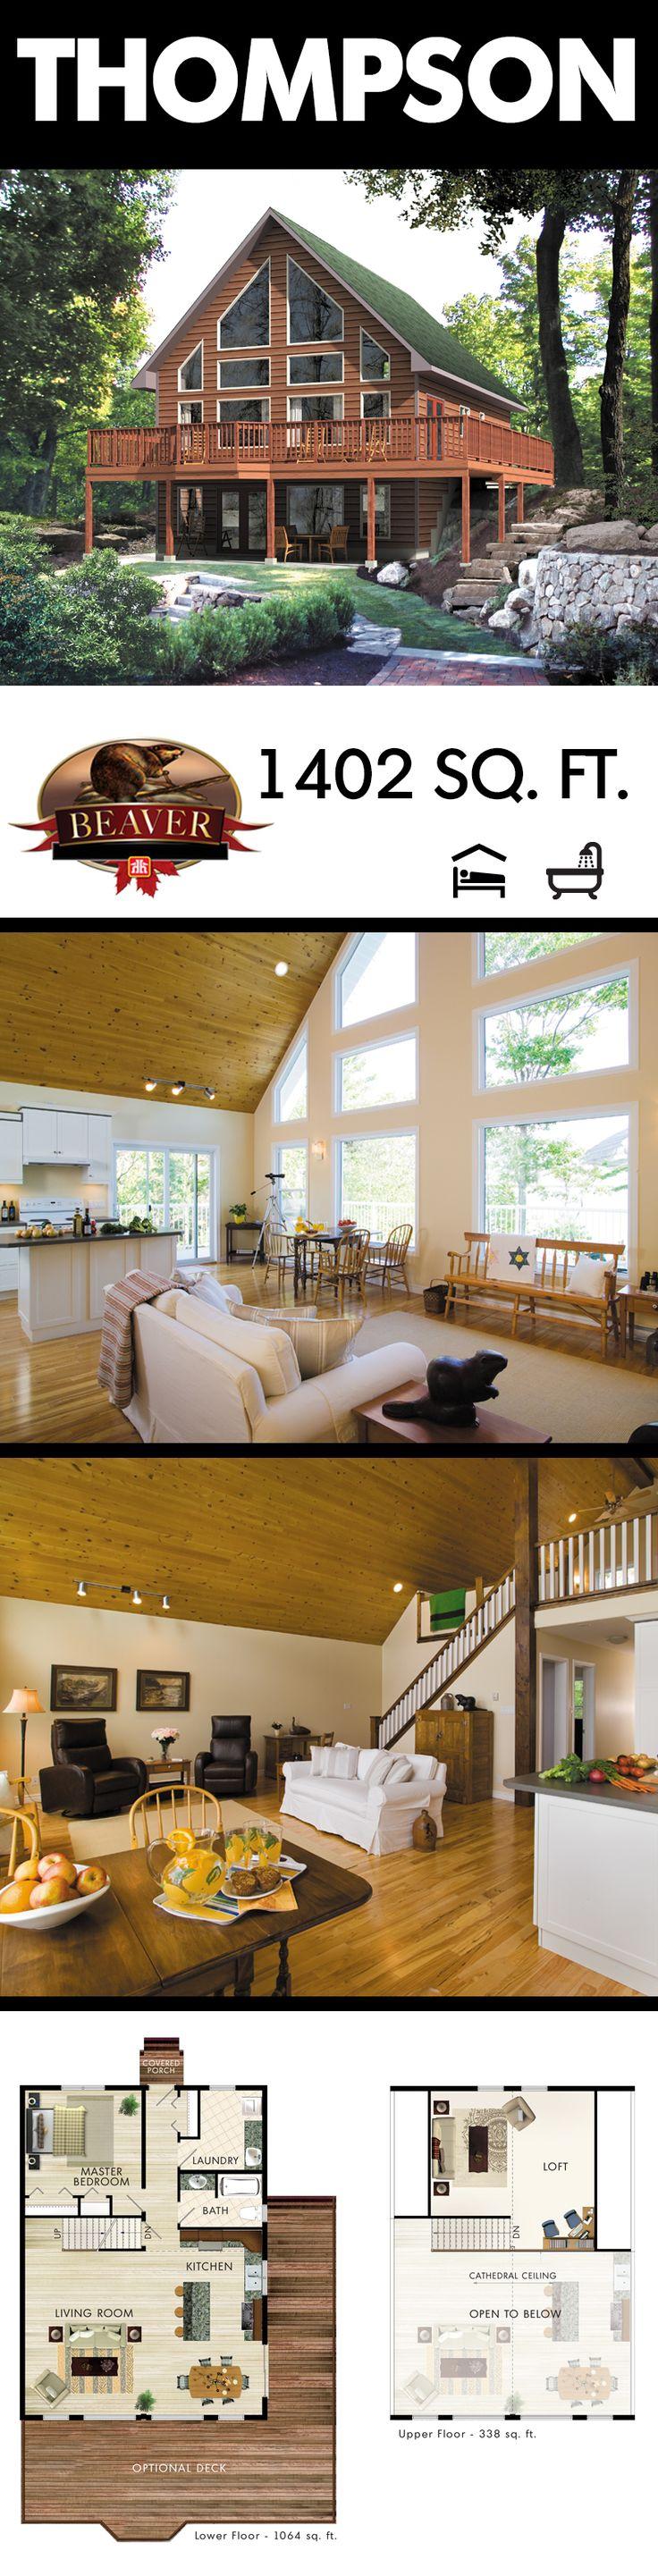 4500 best House Plans images on Pinterest | Ranch house plans ...